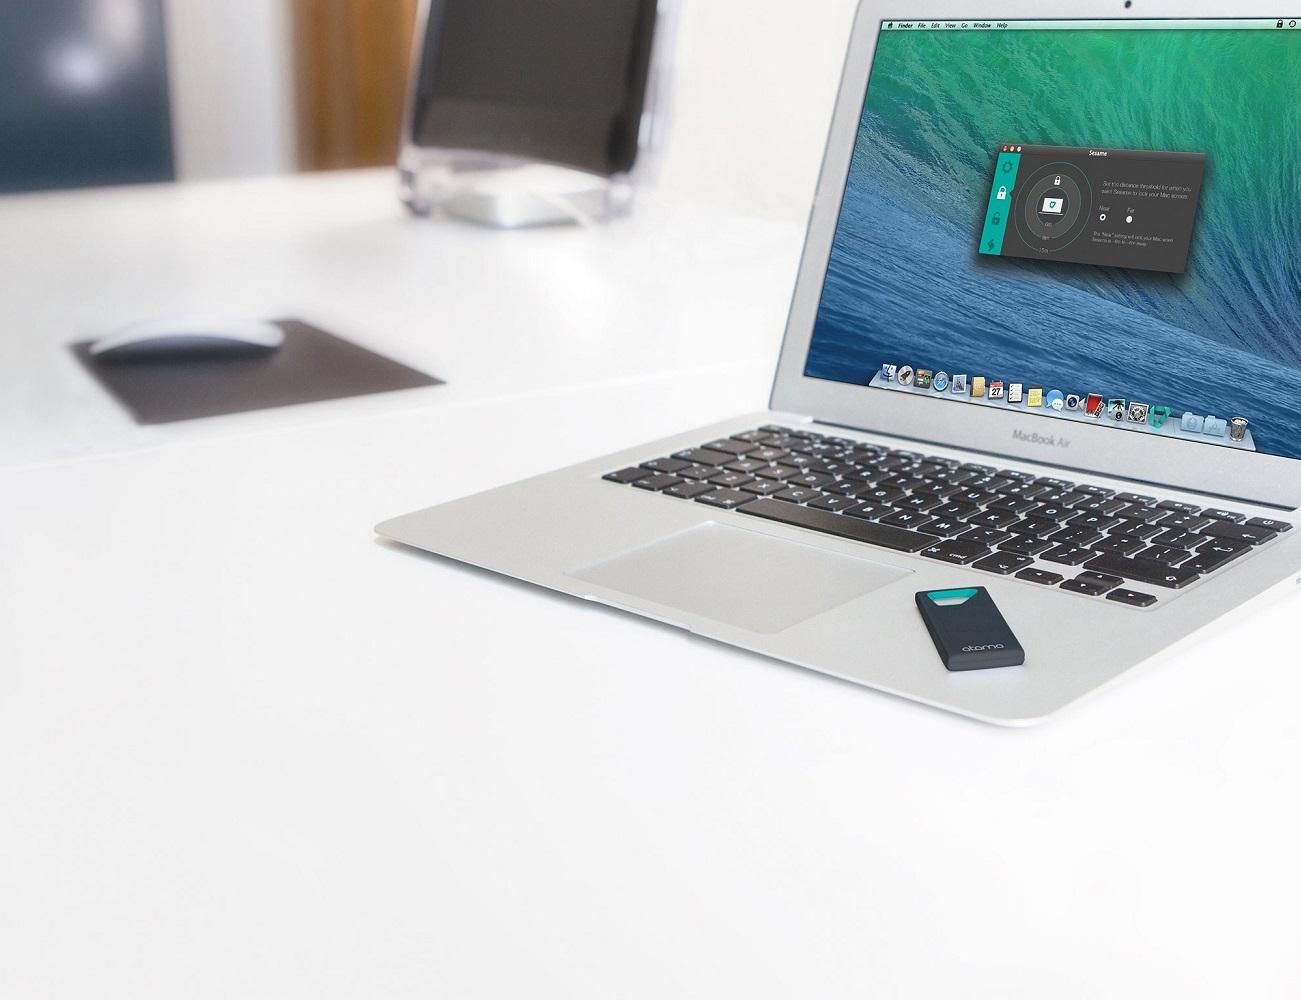 Sesame%2C+The+Wireless+Proximity+Lock+For+Mac